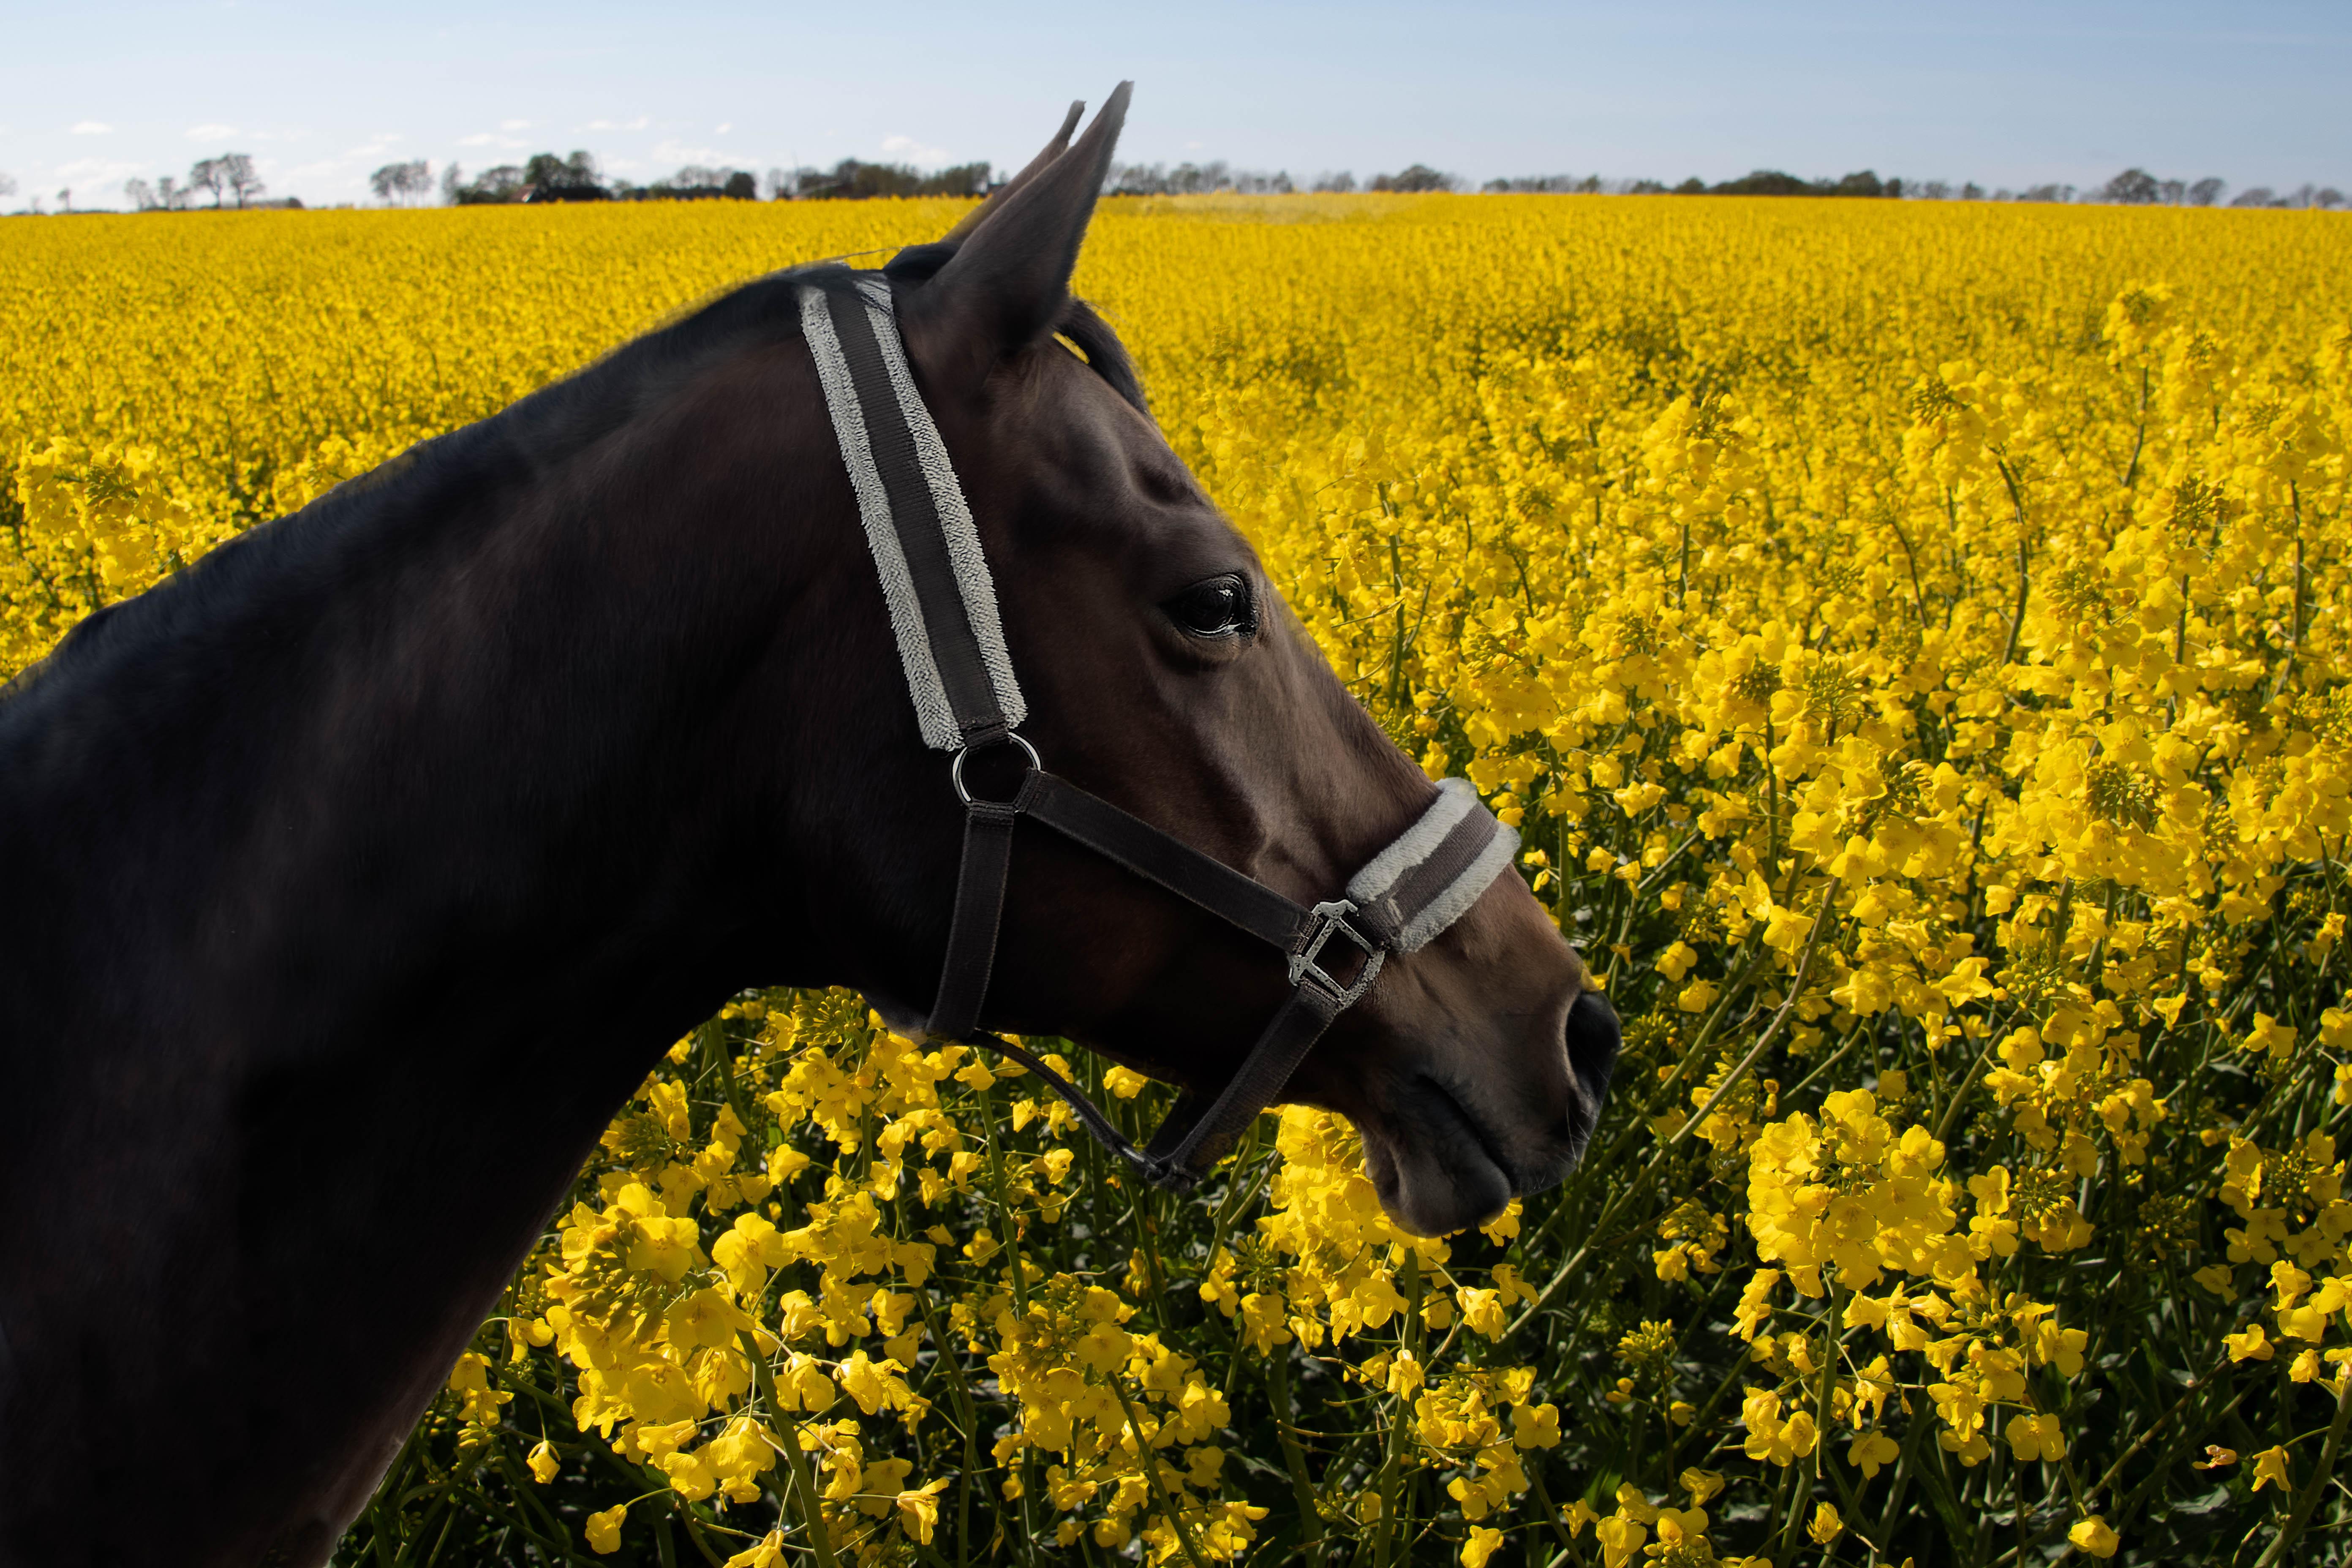 Yellow mustard fields horse view.jpg